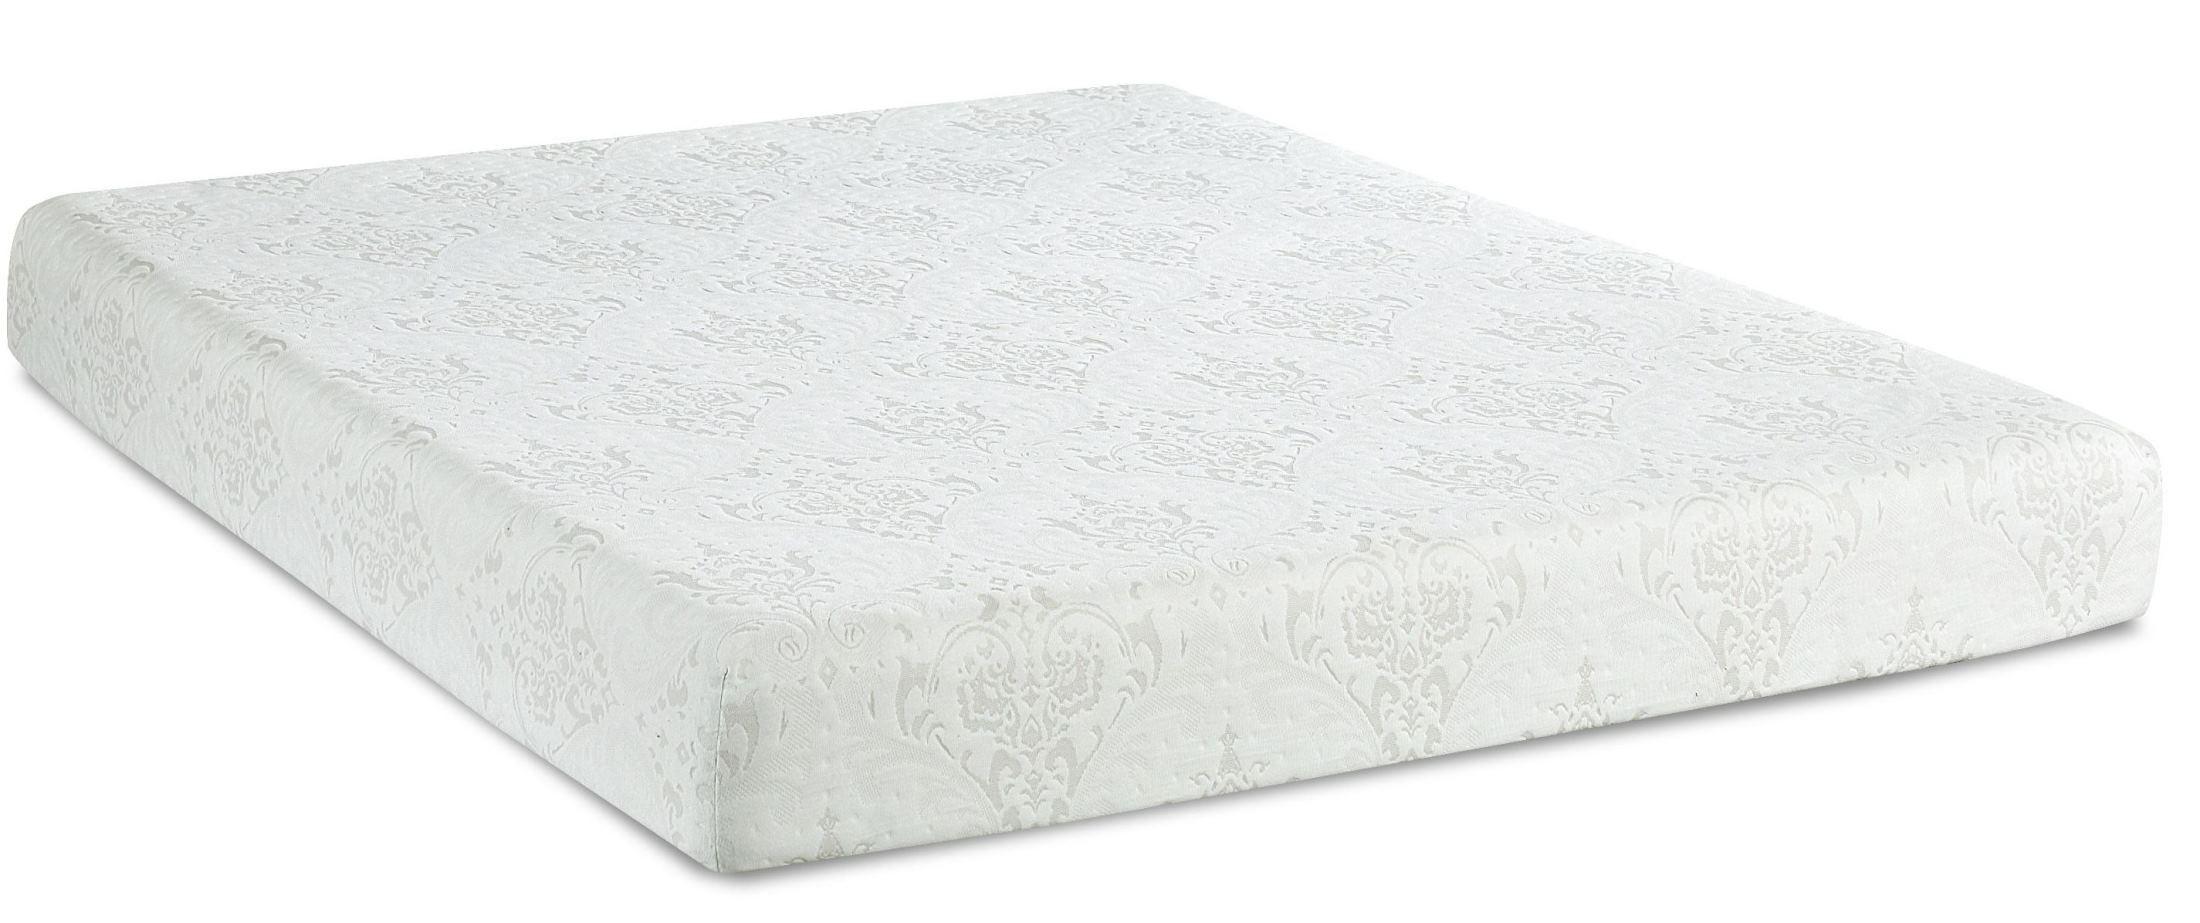 Hampton 8 Memory Foam Queen Mattress From Klaussner Hamptonqqmat Coleman Furniture